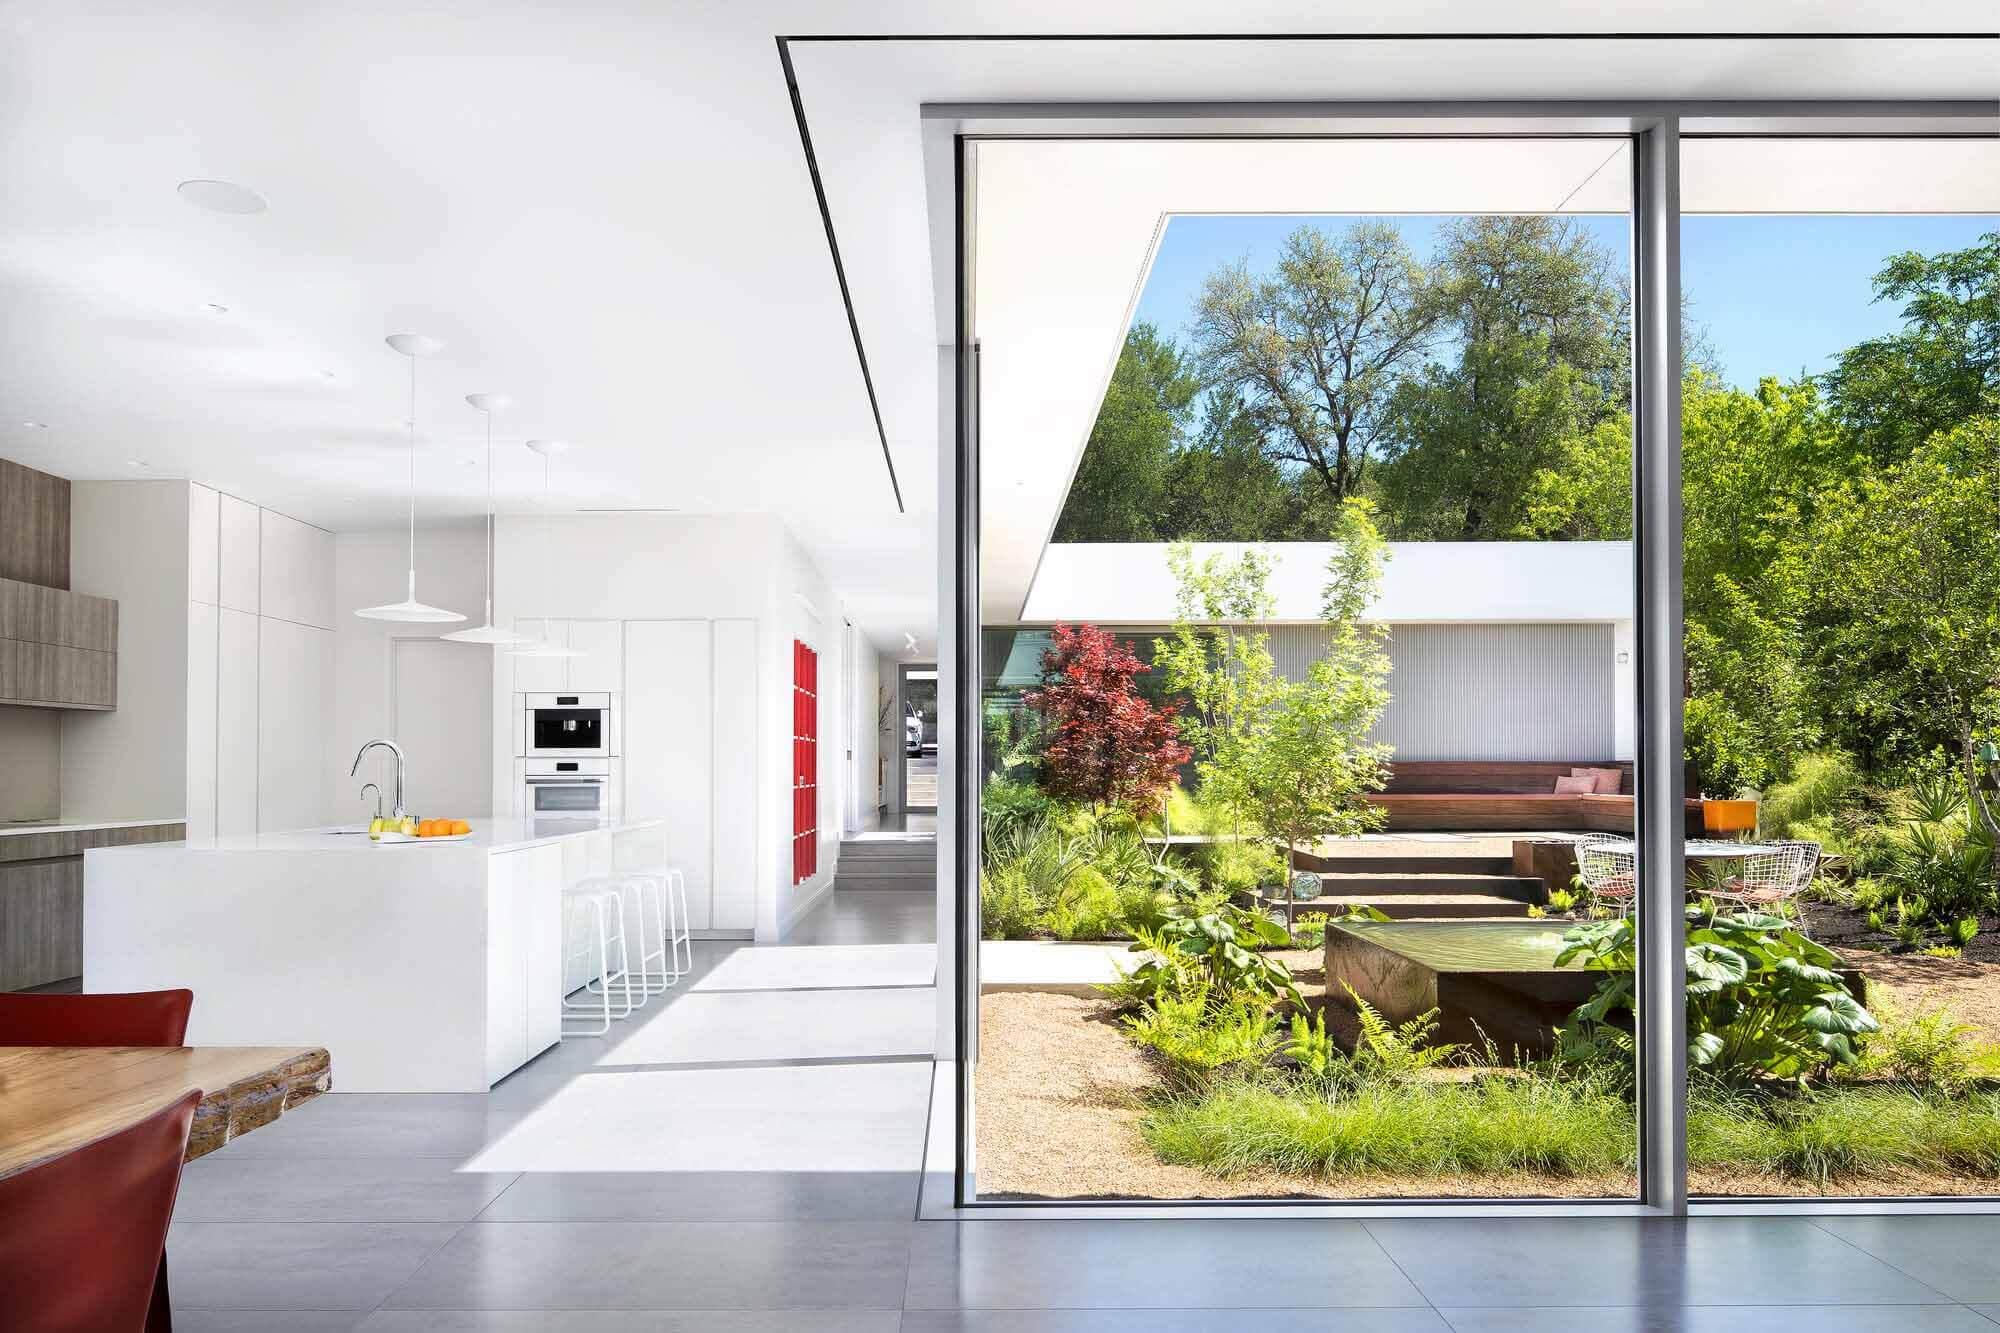 Five Yard House / Miró Rivera Architects